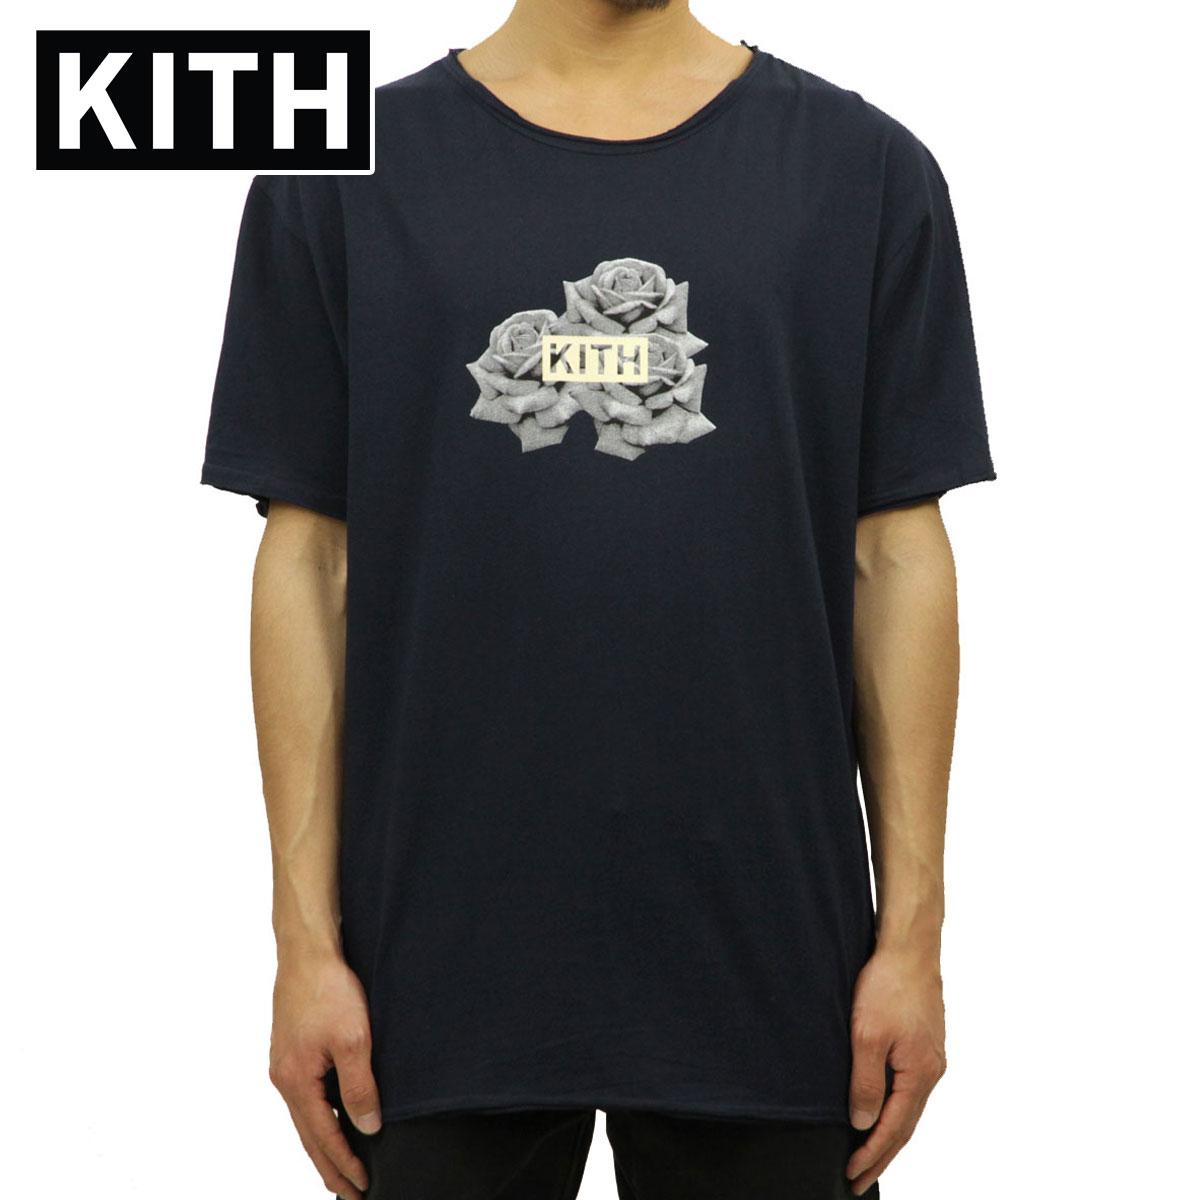 64f72a805a Kith T Shirt - Our T Shirt